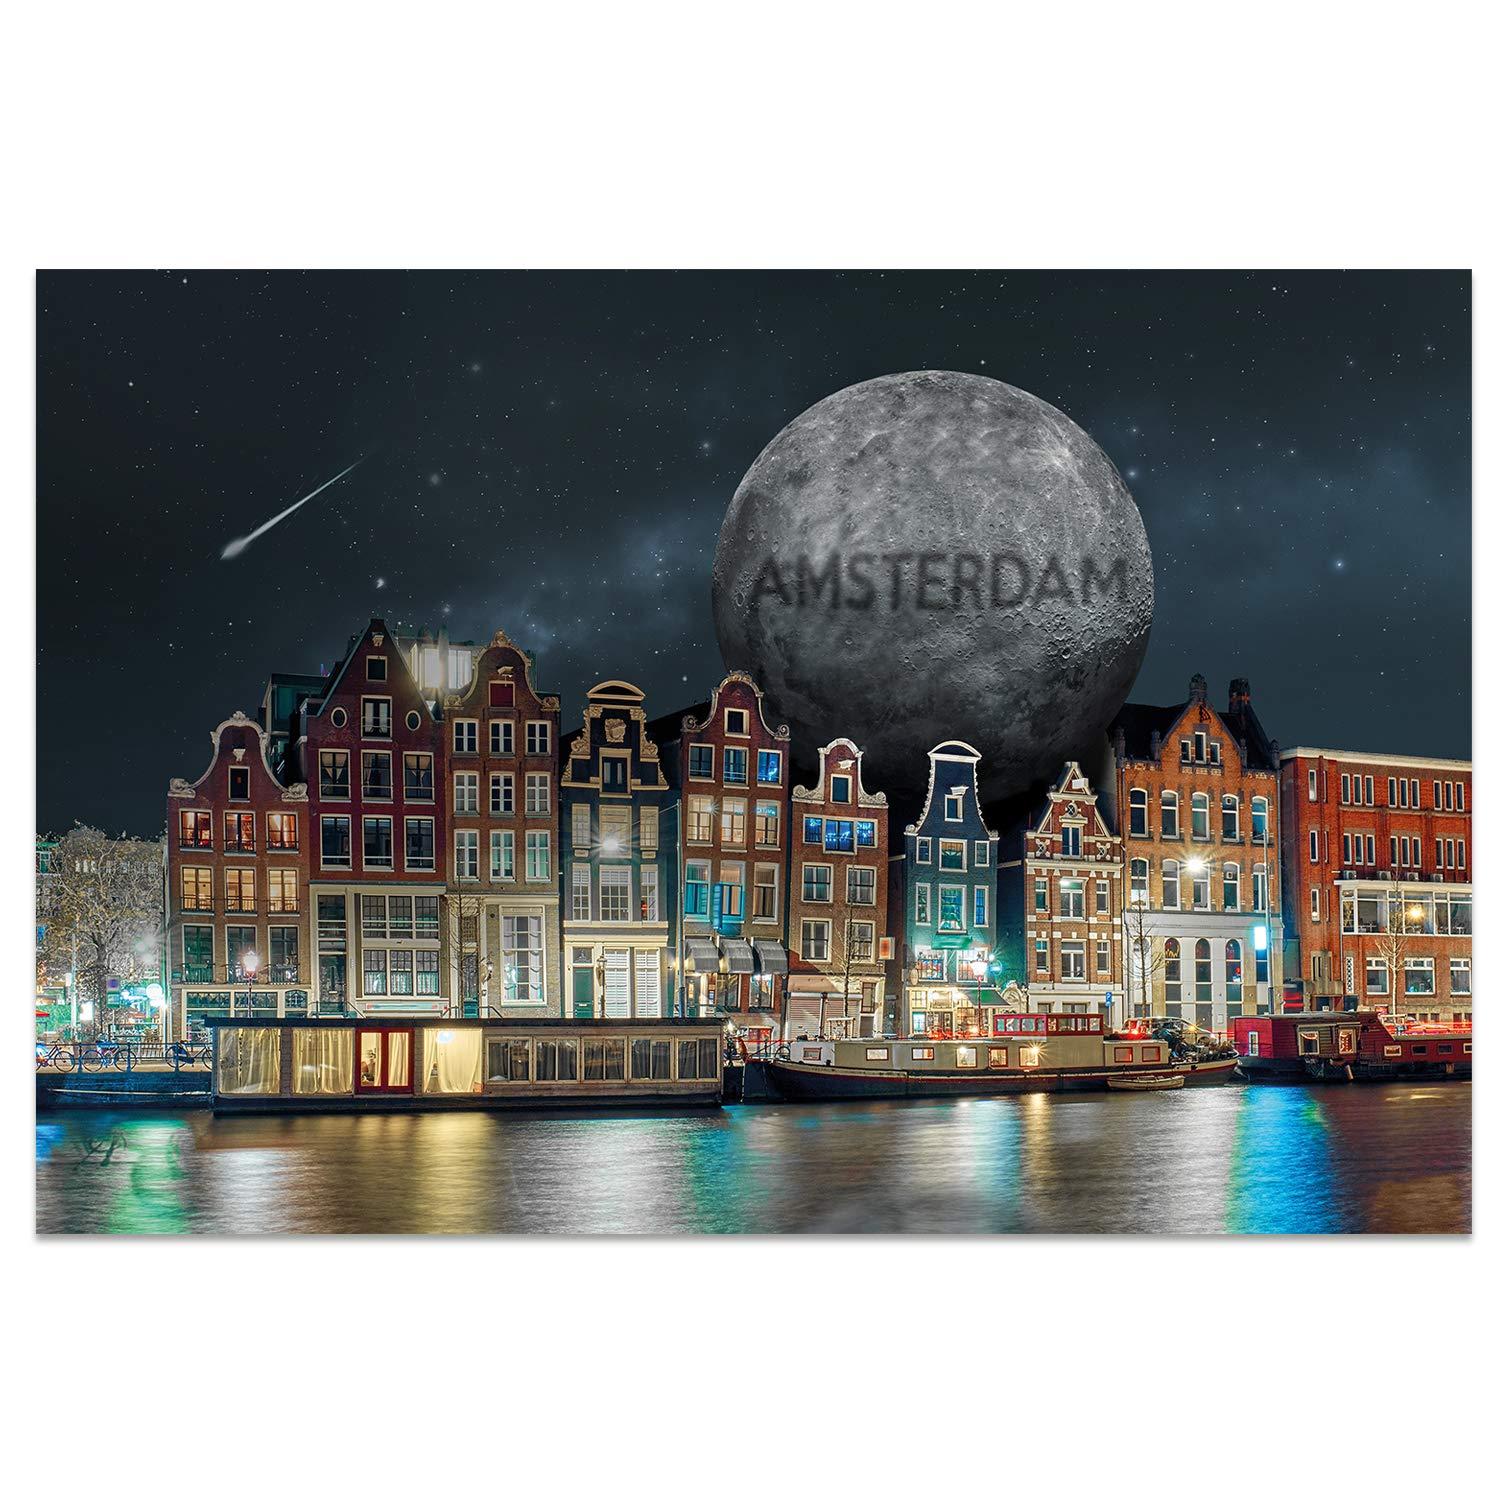 DIN A6 AMSTERDAM Motiv Lovely Amsterdam I stadtecken I Hochwertige Ansichtskarten I Leben /& Momente Lustig I Postkarten Postcrossing I Geschenk I Geschenkidee Postkarten +